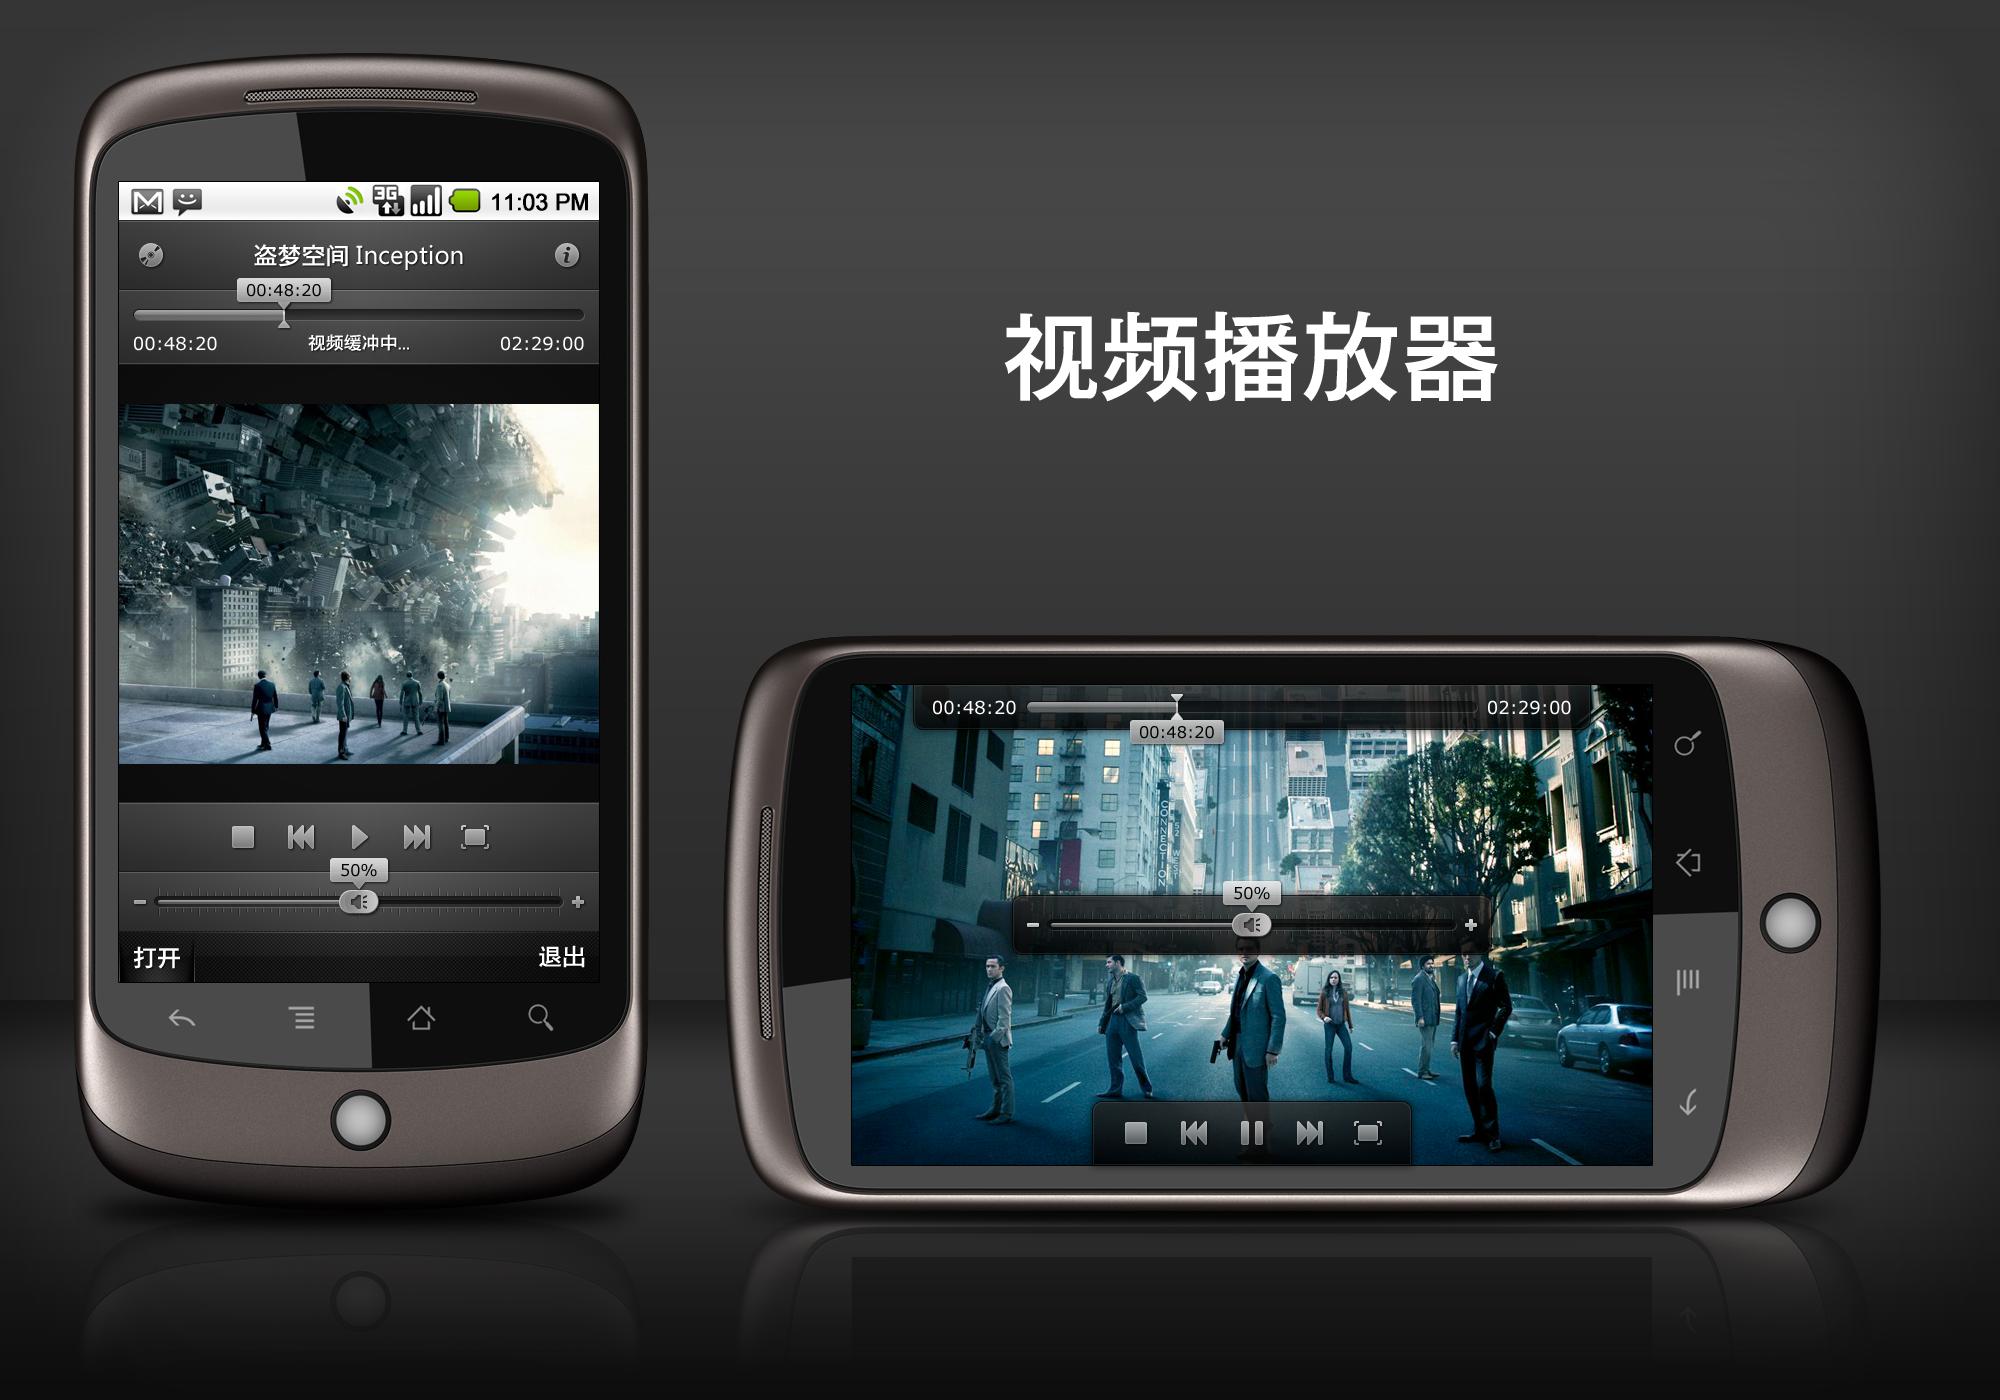 p30手机如何下载连续视频播放器歌曲